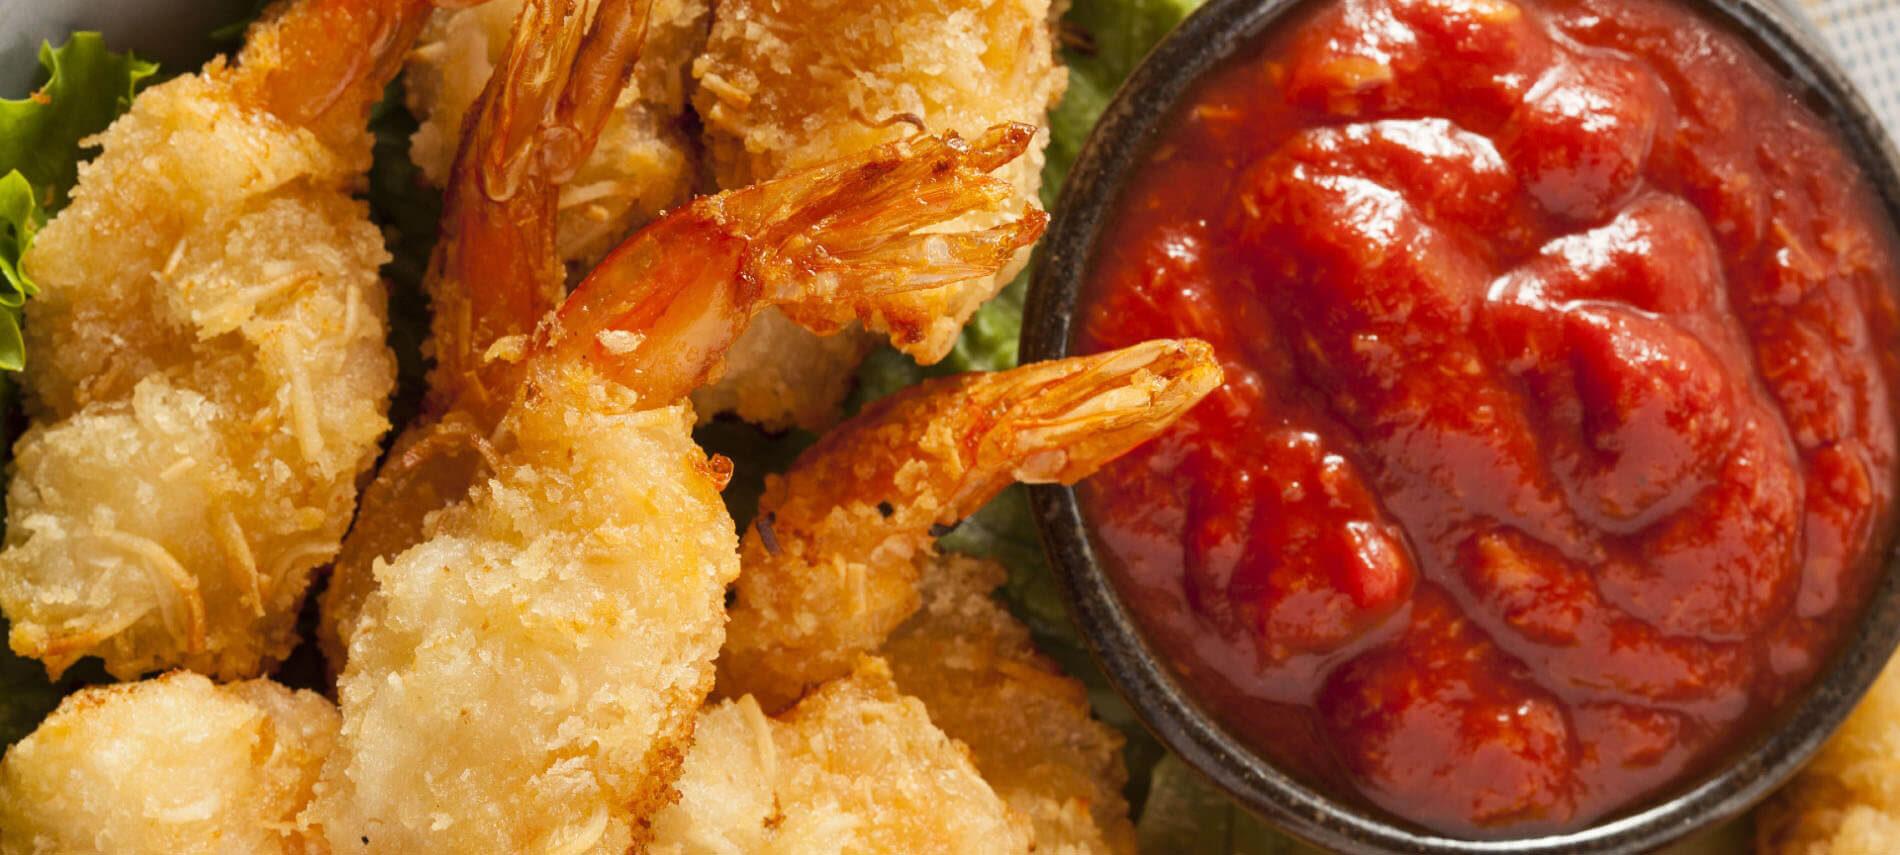 Cocktail Sauce with Golden Fried Shrimp